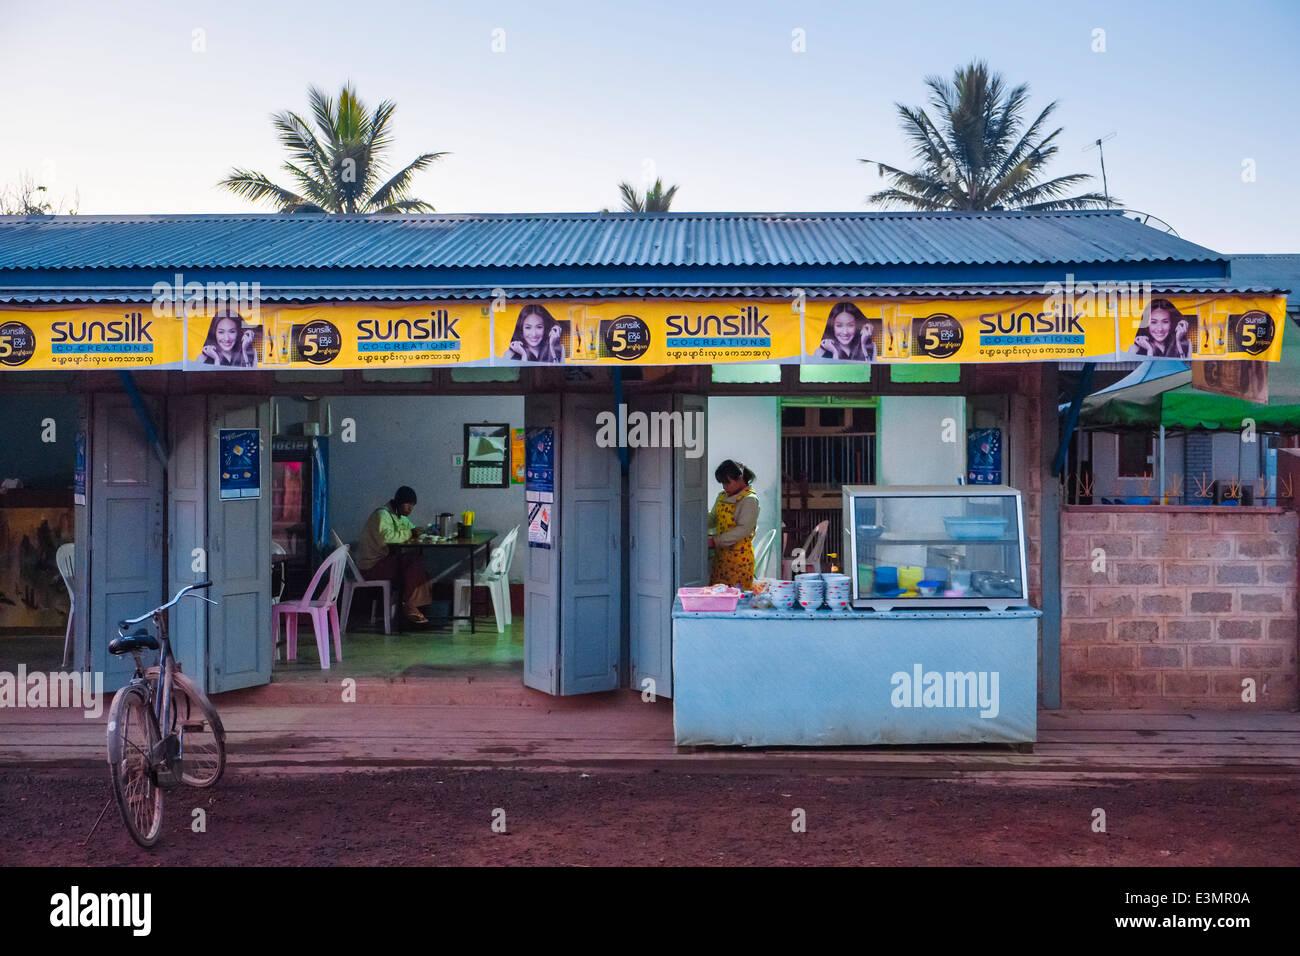 Restaurant, Nyaung Shwe, Myanmar, Asia - Stock Image